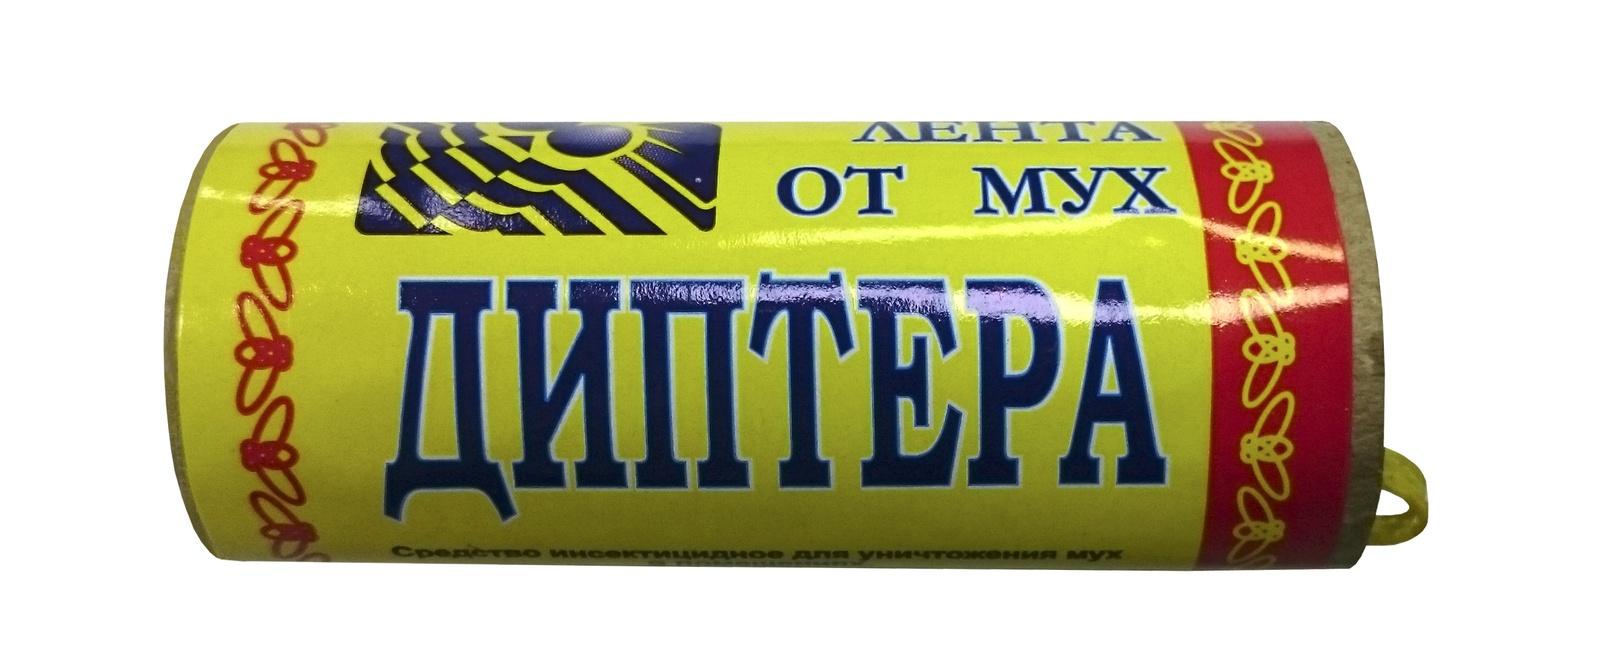 ДИПТЕРА липкая лента от мух, упаковка 104 шт. средство от мух в помещении